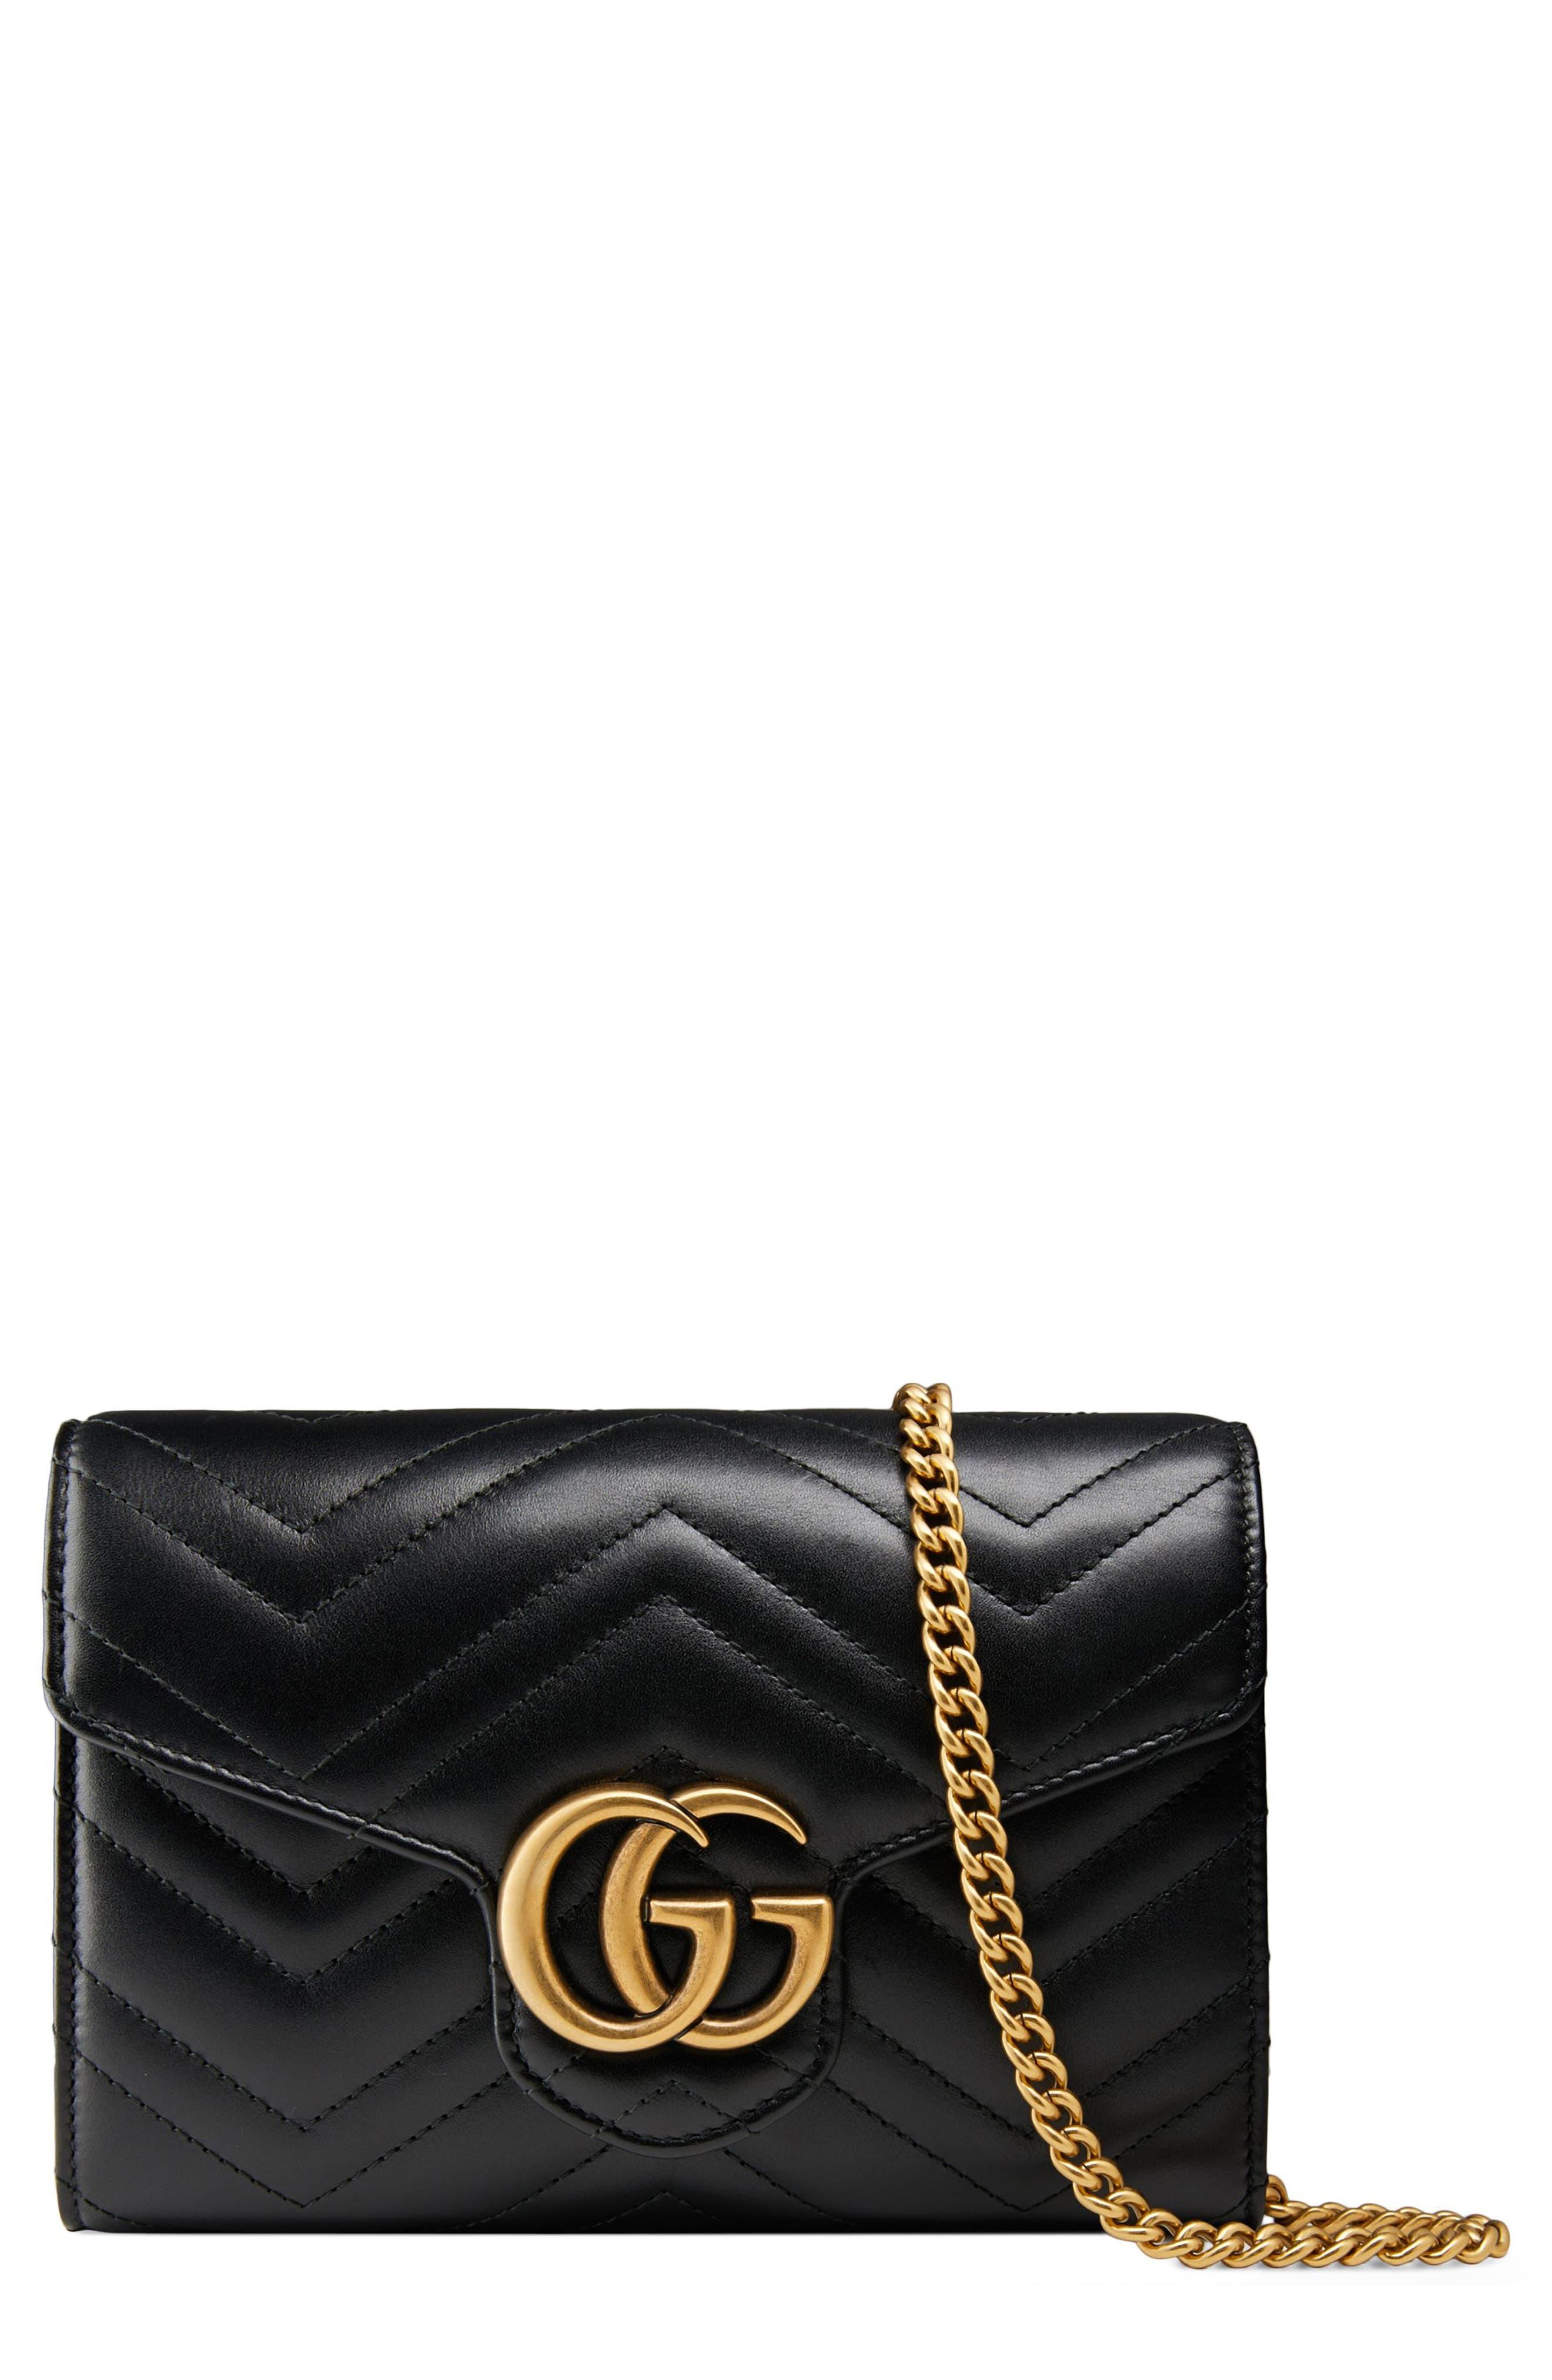 GUCCI, GG Marmont Matelassé Leather Wallet on a Chain, Main thumbnail 1, color, NERO